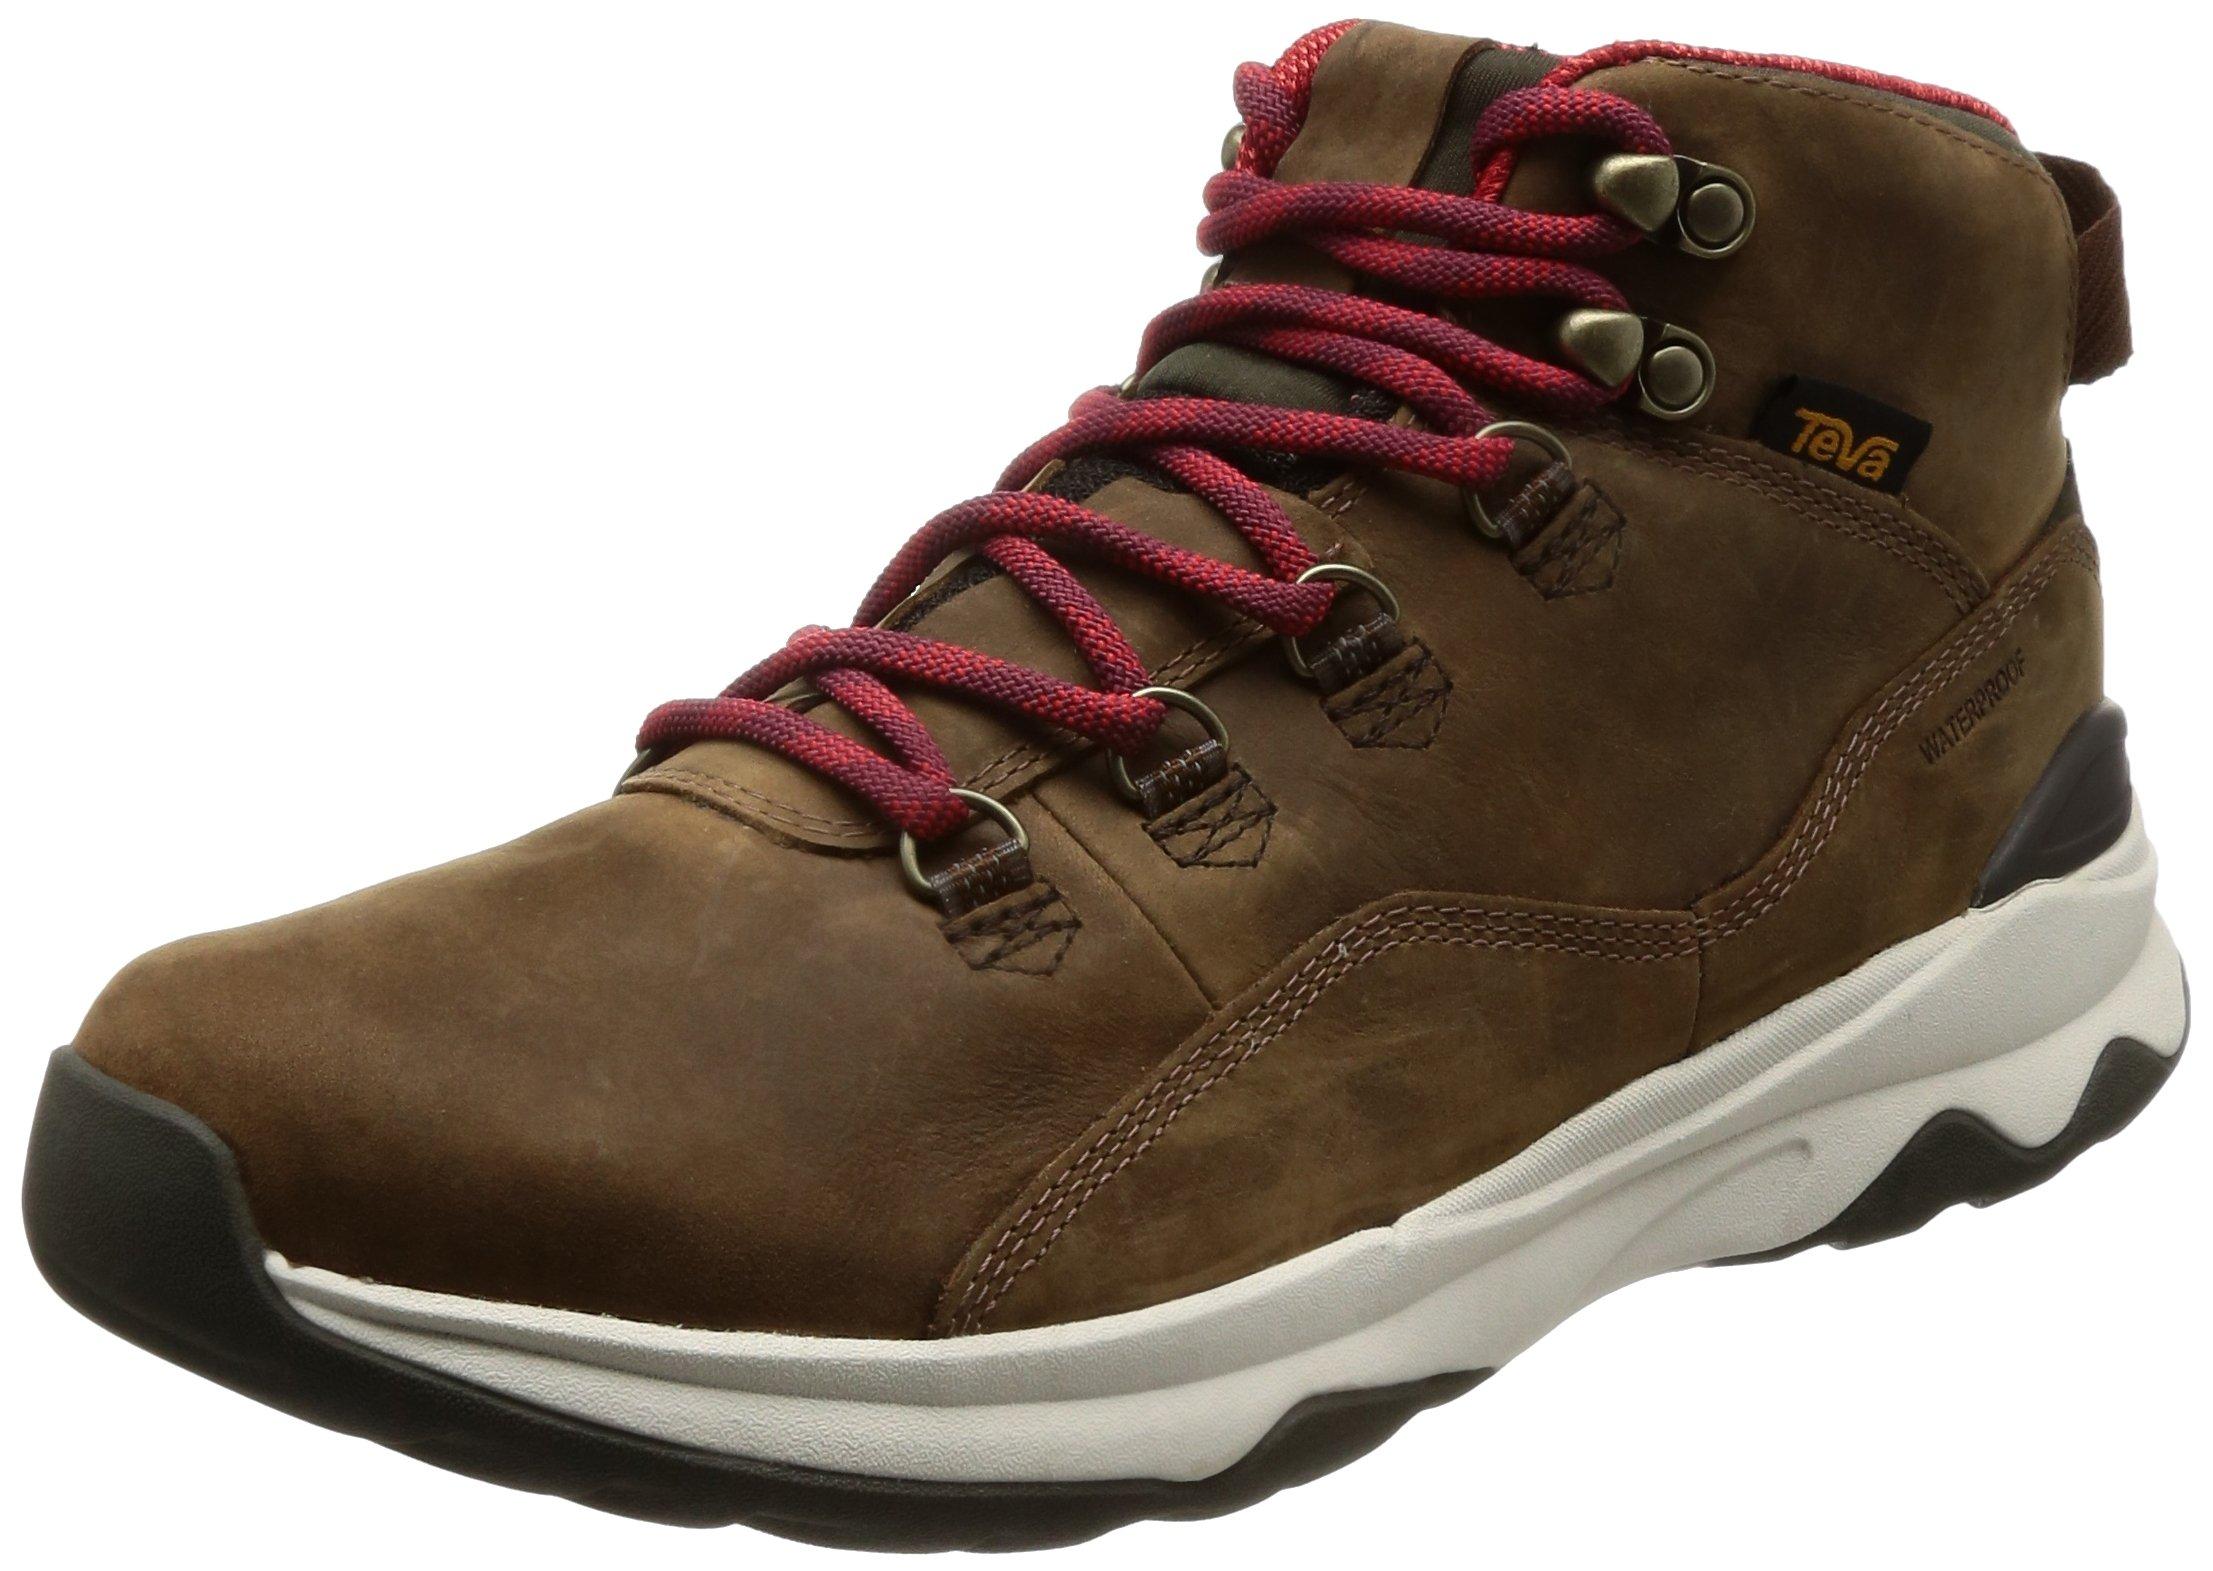 Teva Arrowood Utility Mid Men's Boot 11 D(M) US Brown